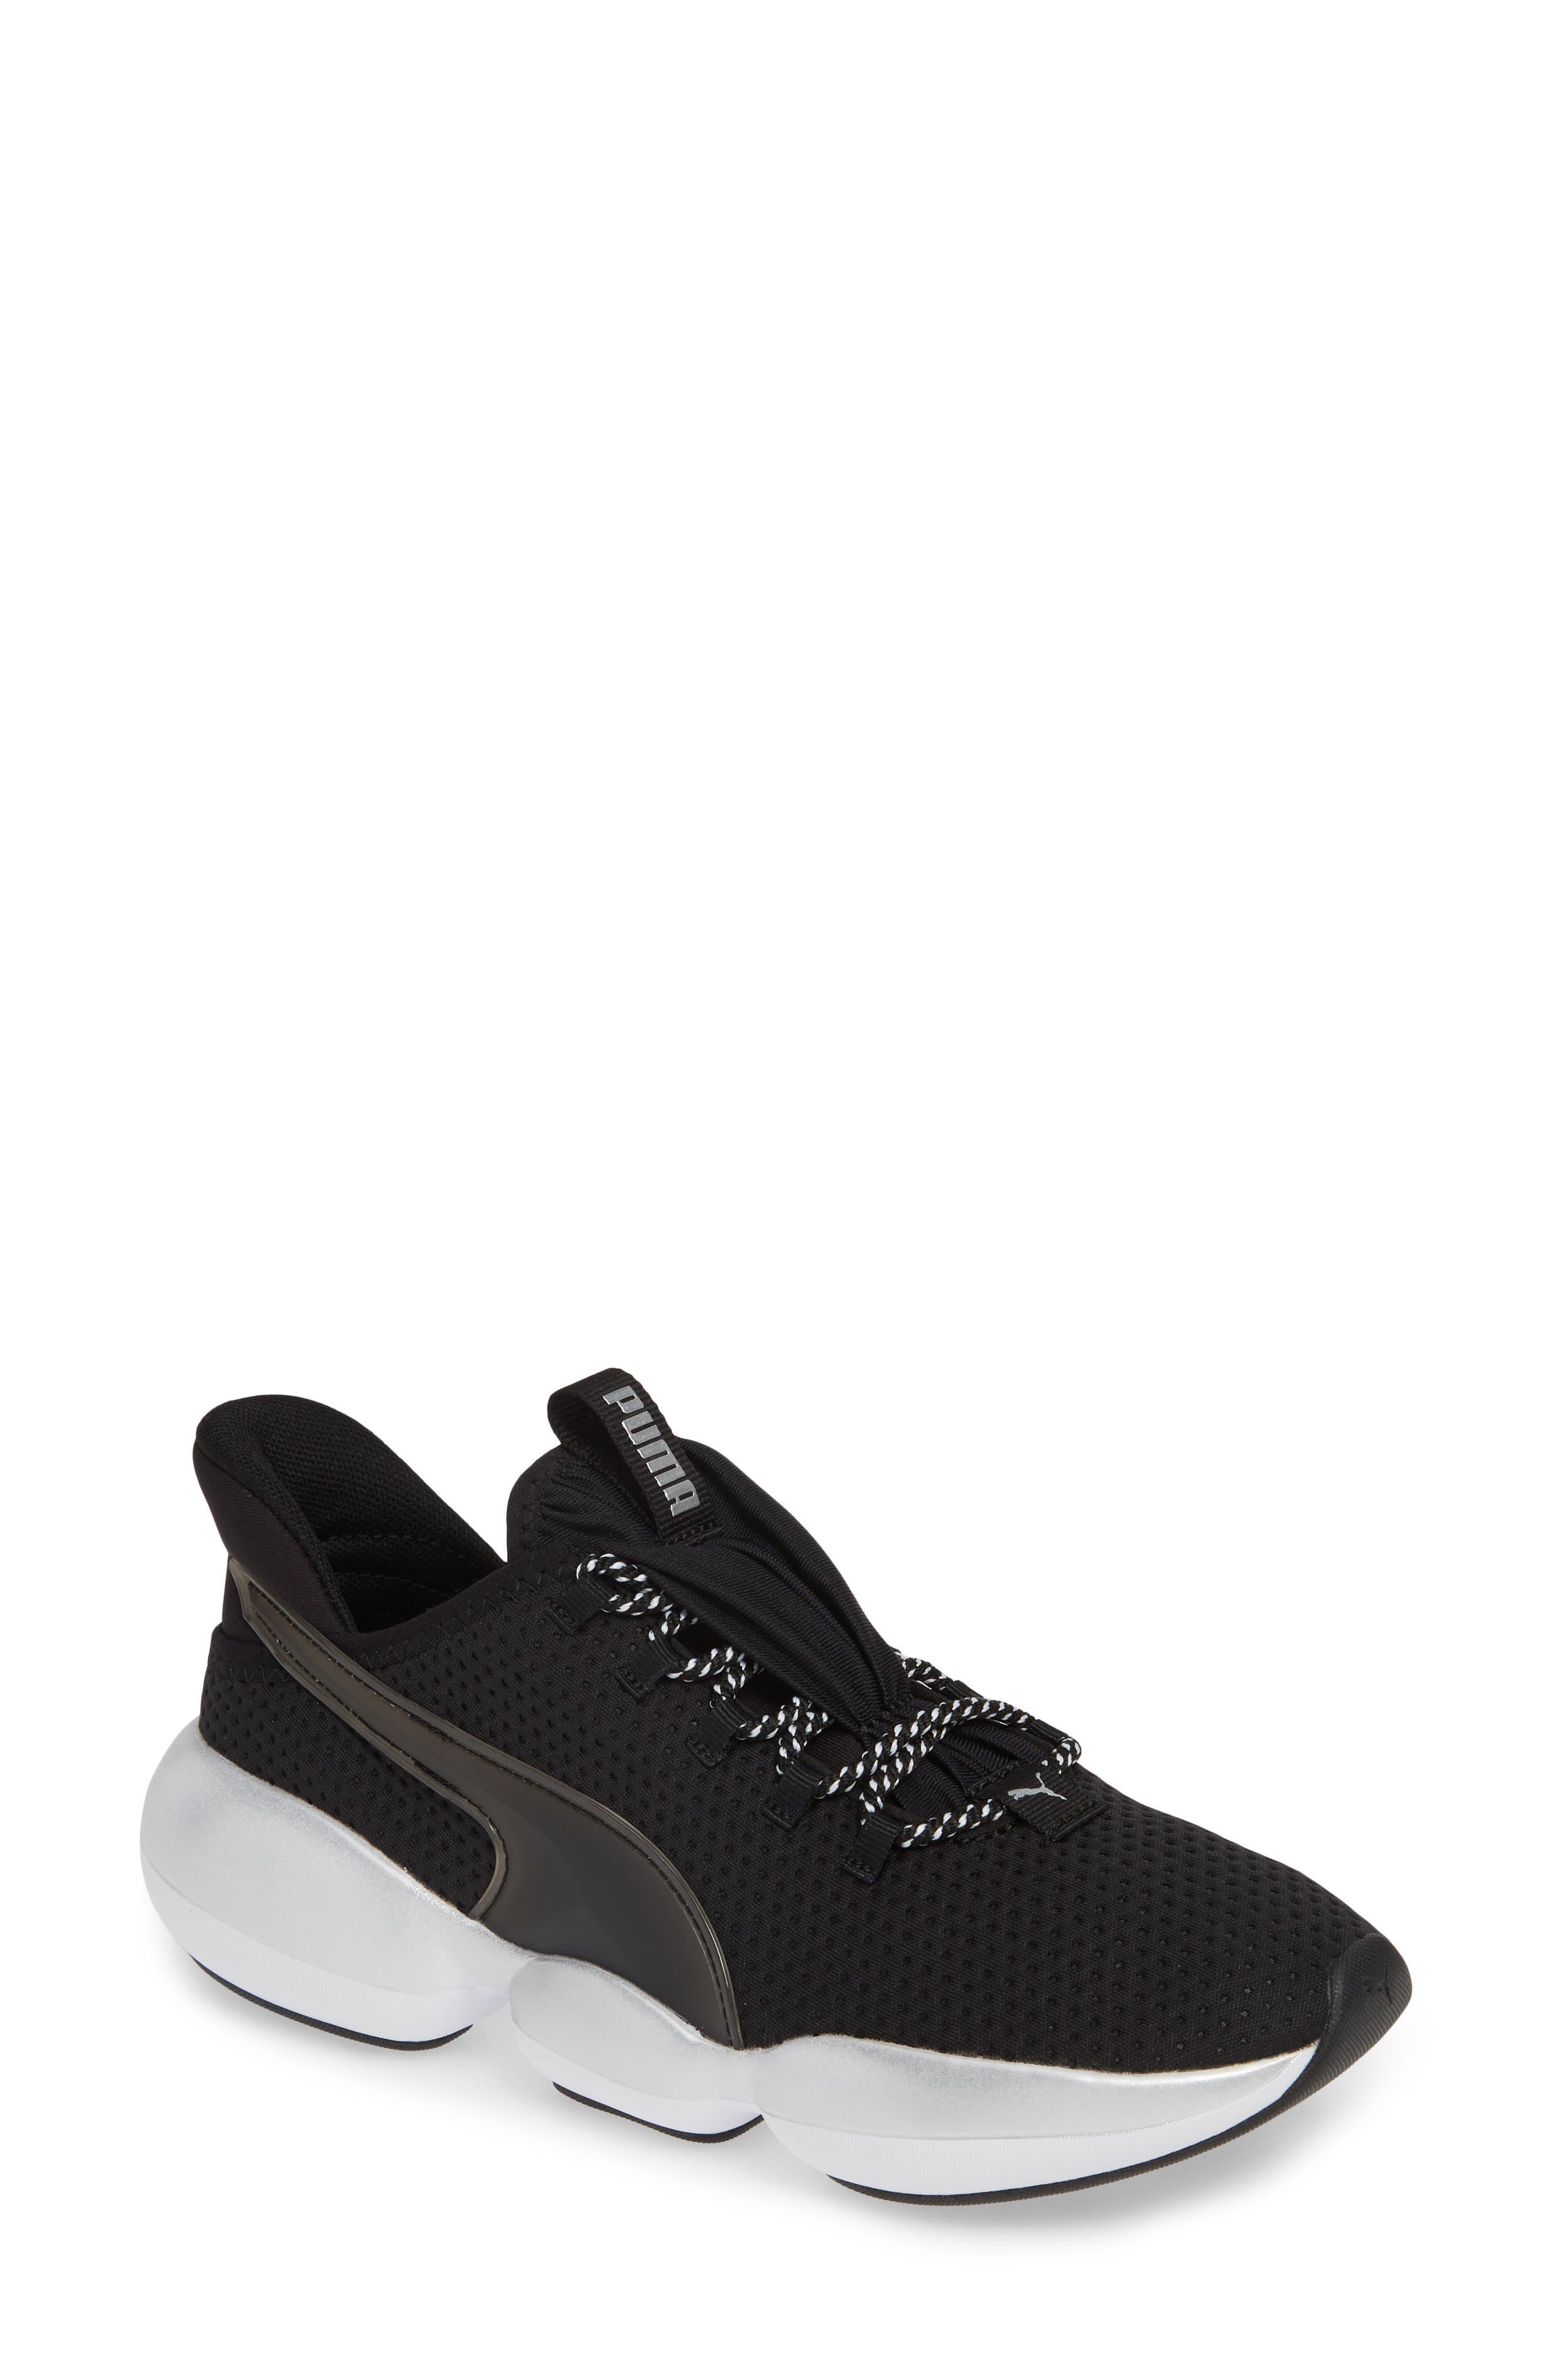 PUMA Mode XT Hybrid Training Shoe, Main, color, BLACK